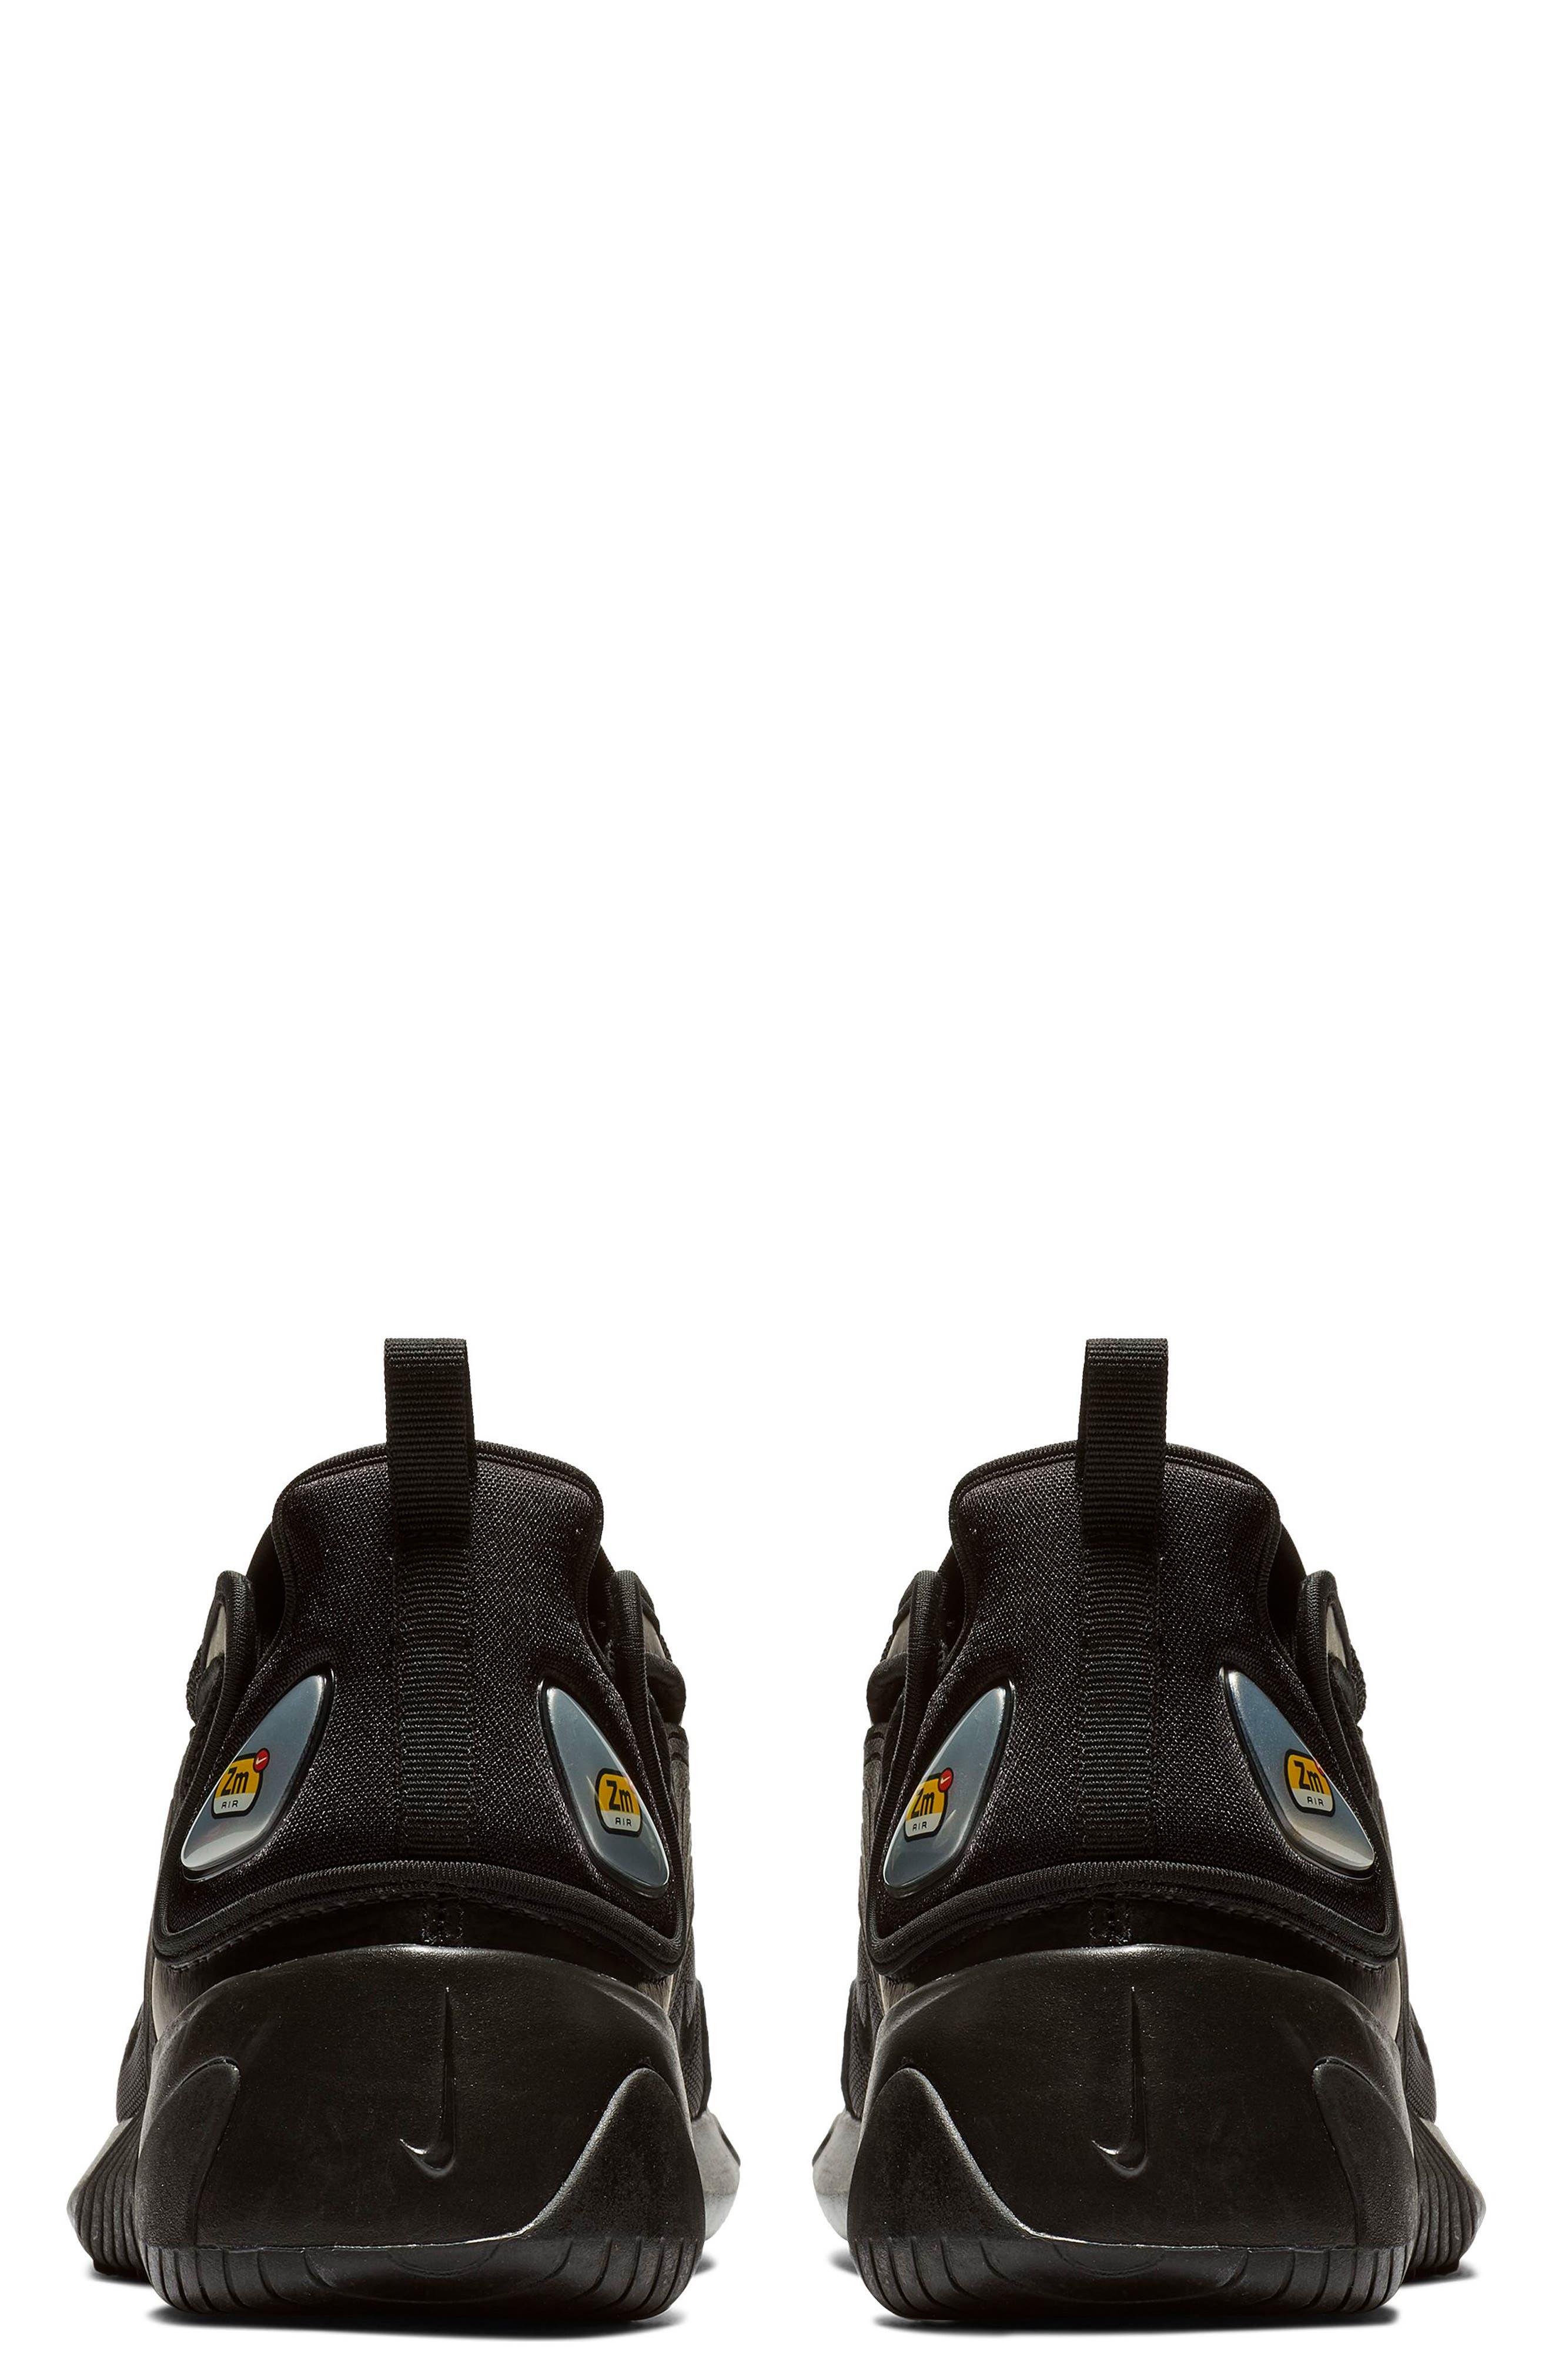 Zoom 2K Sneaker,                             Alternate thumbnail 2, color,                             BLACK/ BLACK/ ANTHRACITE